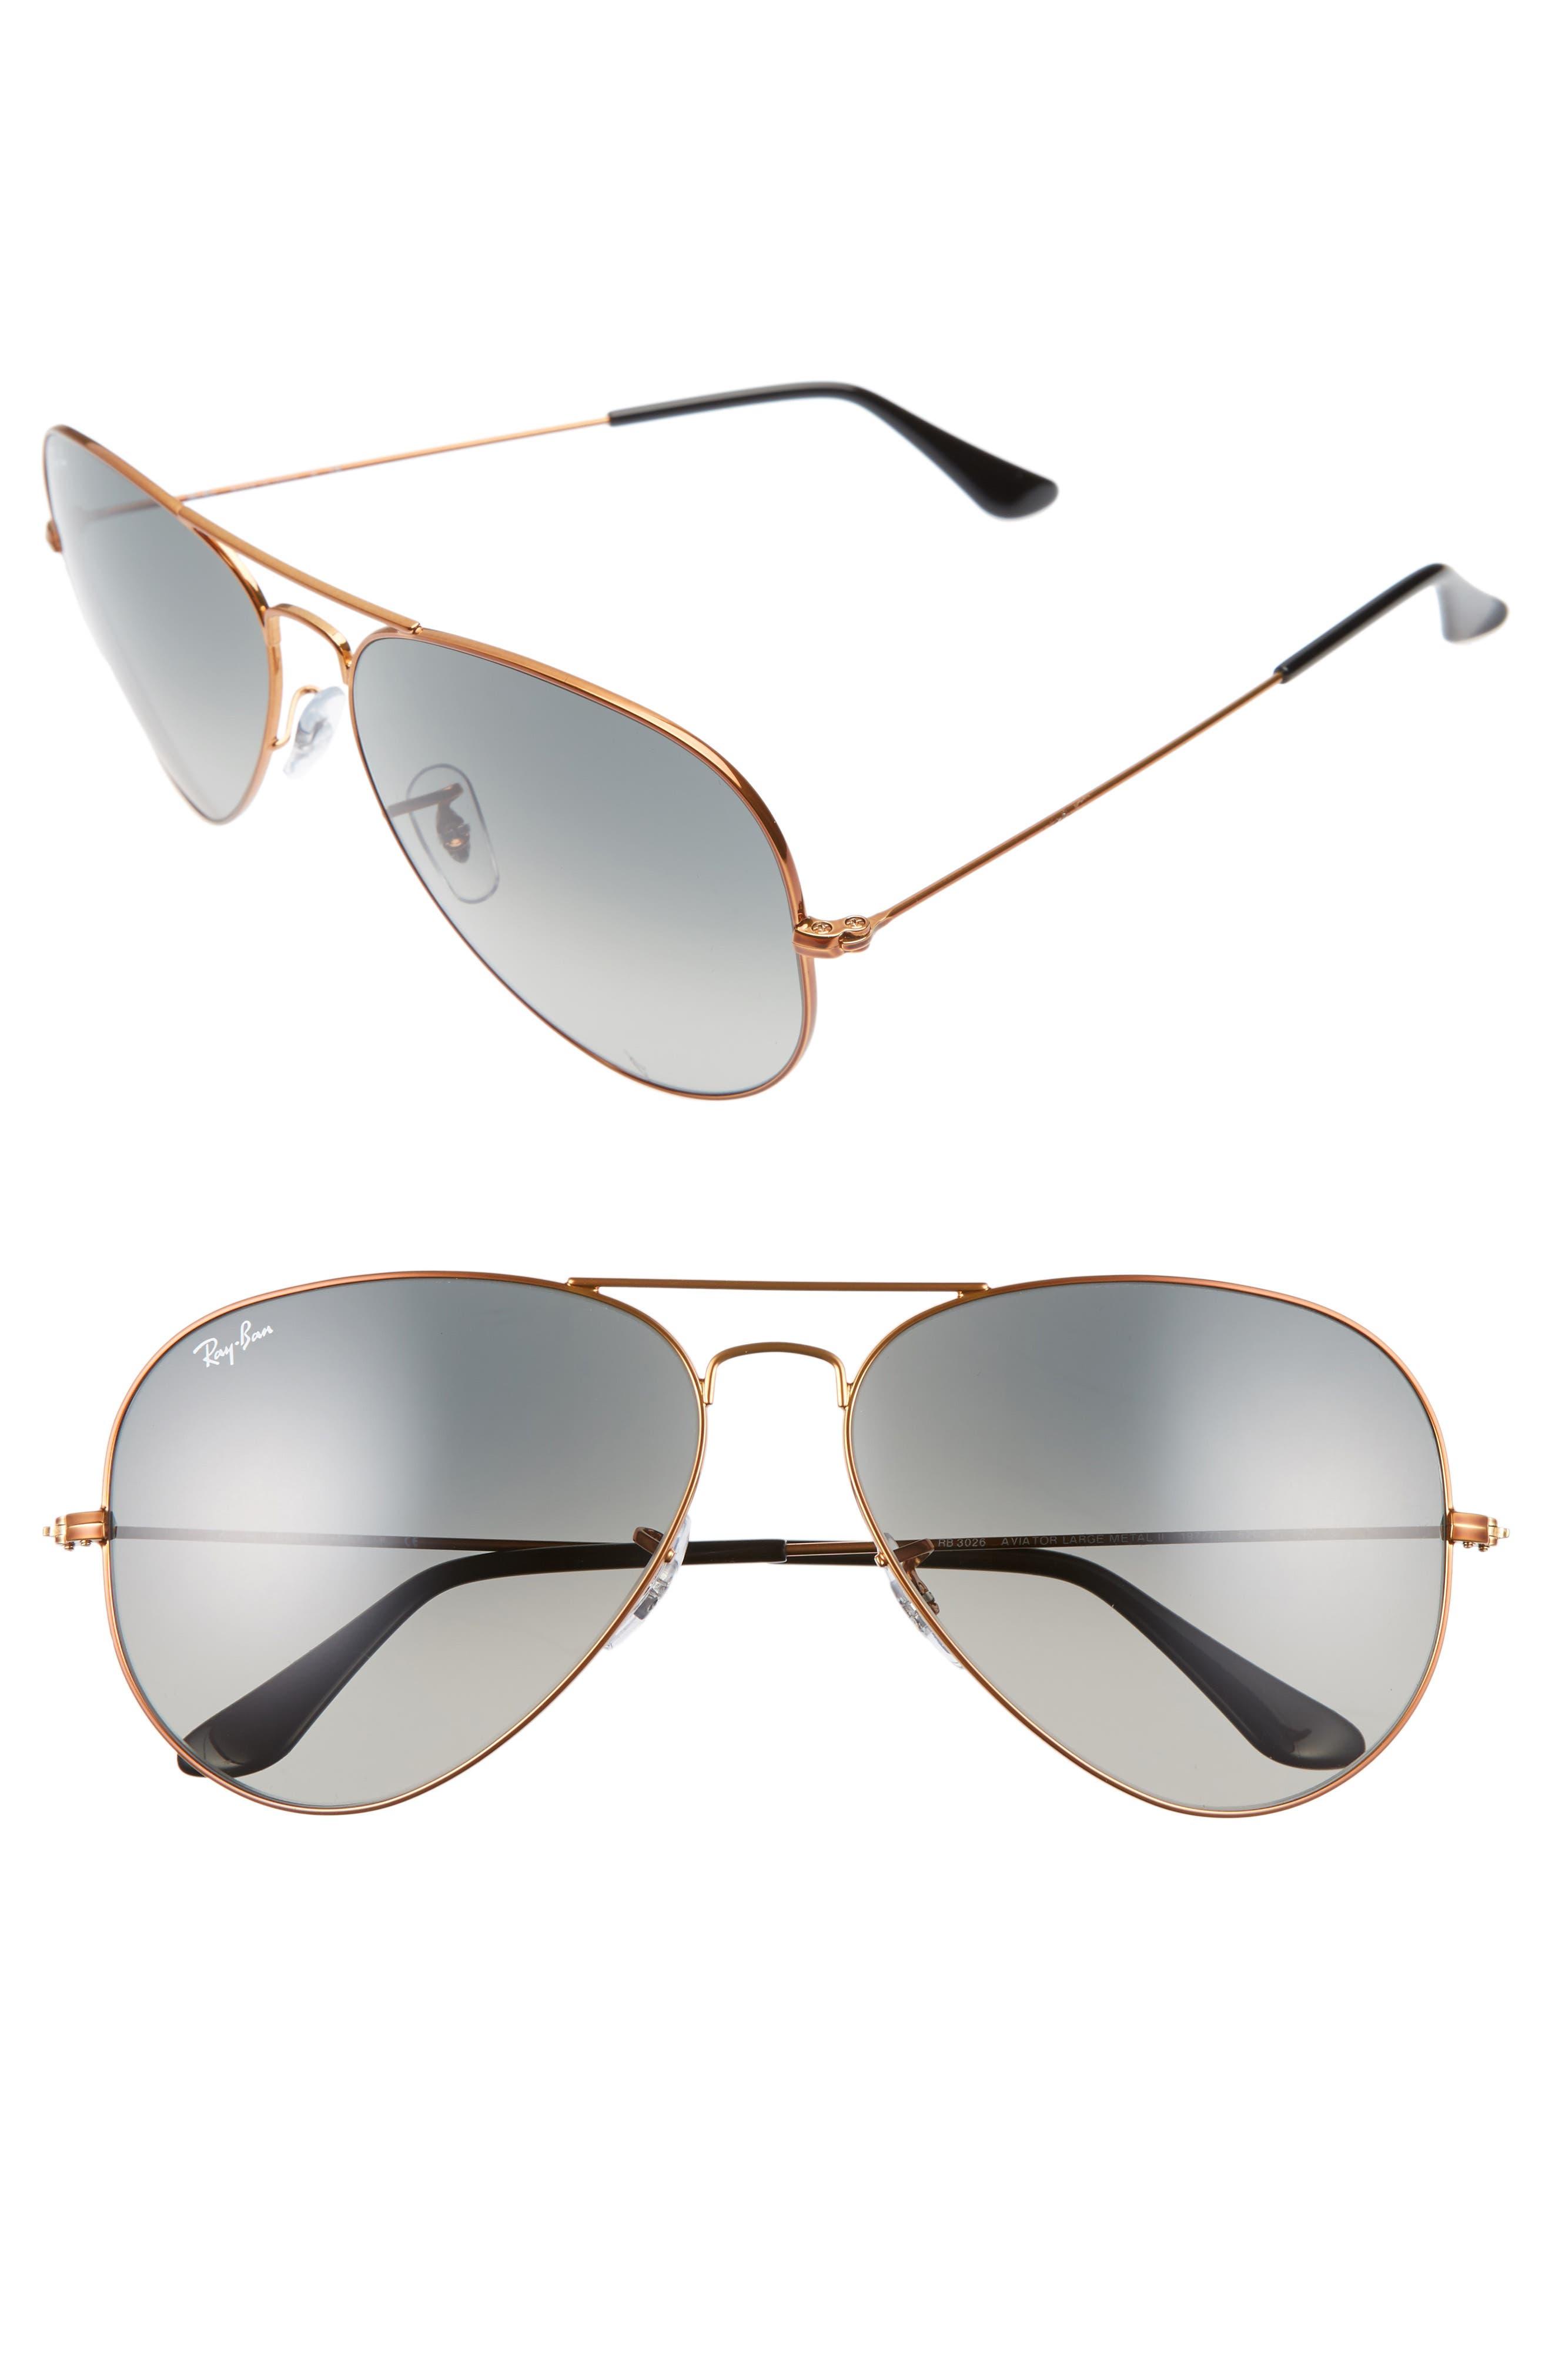 62mm Sunglasses,                             Main thumbnail 1, color,